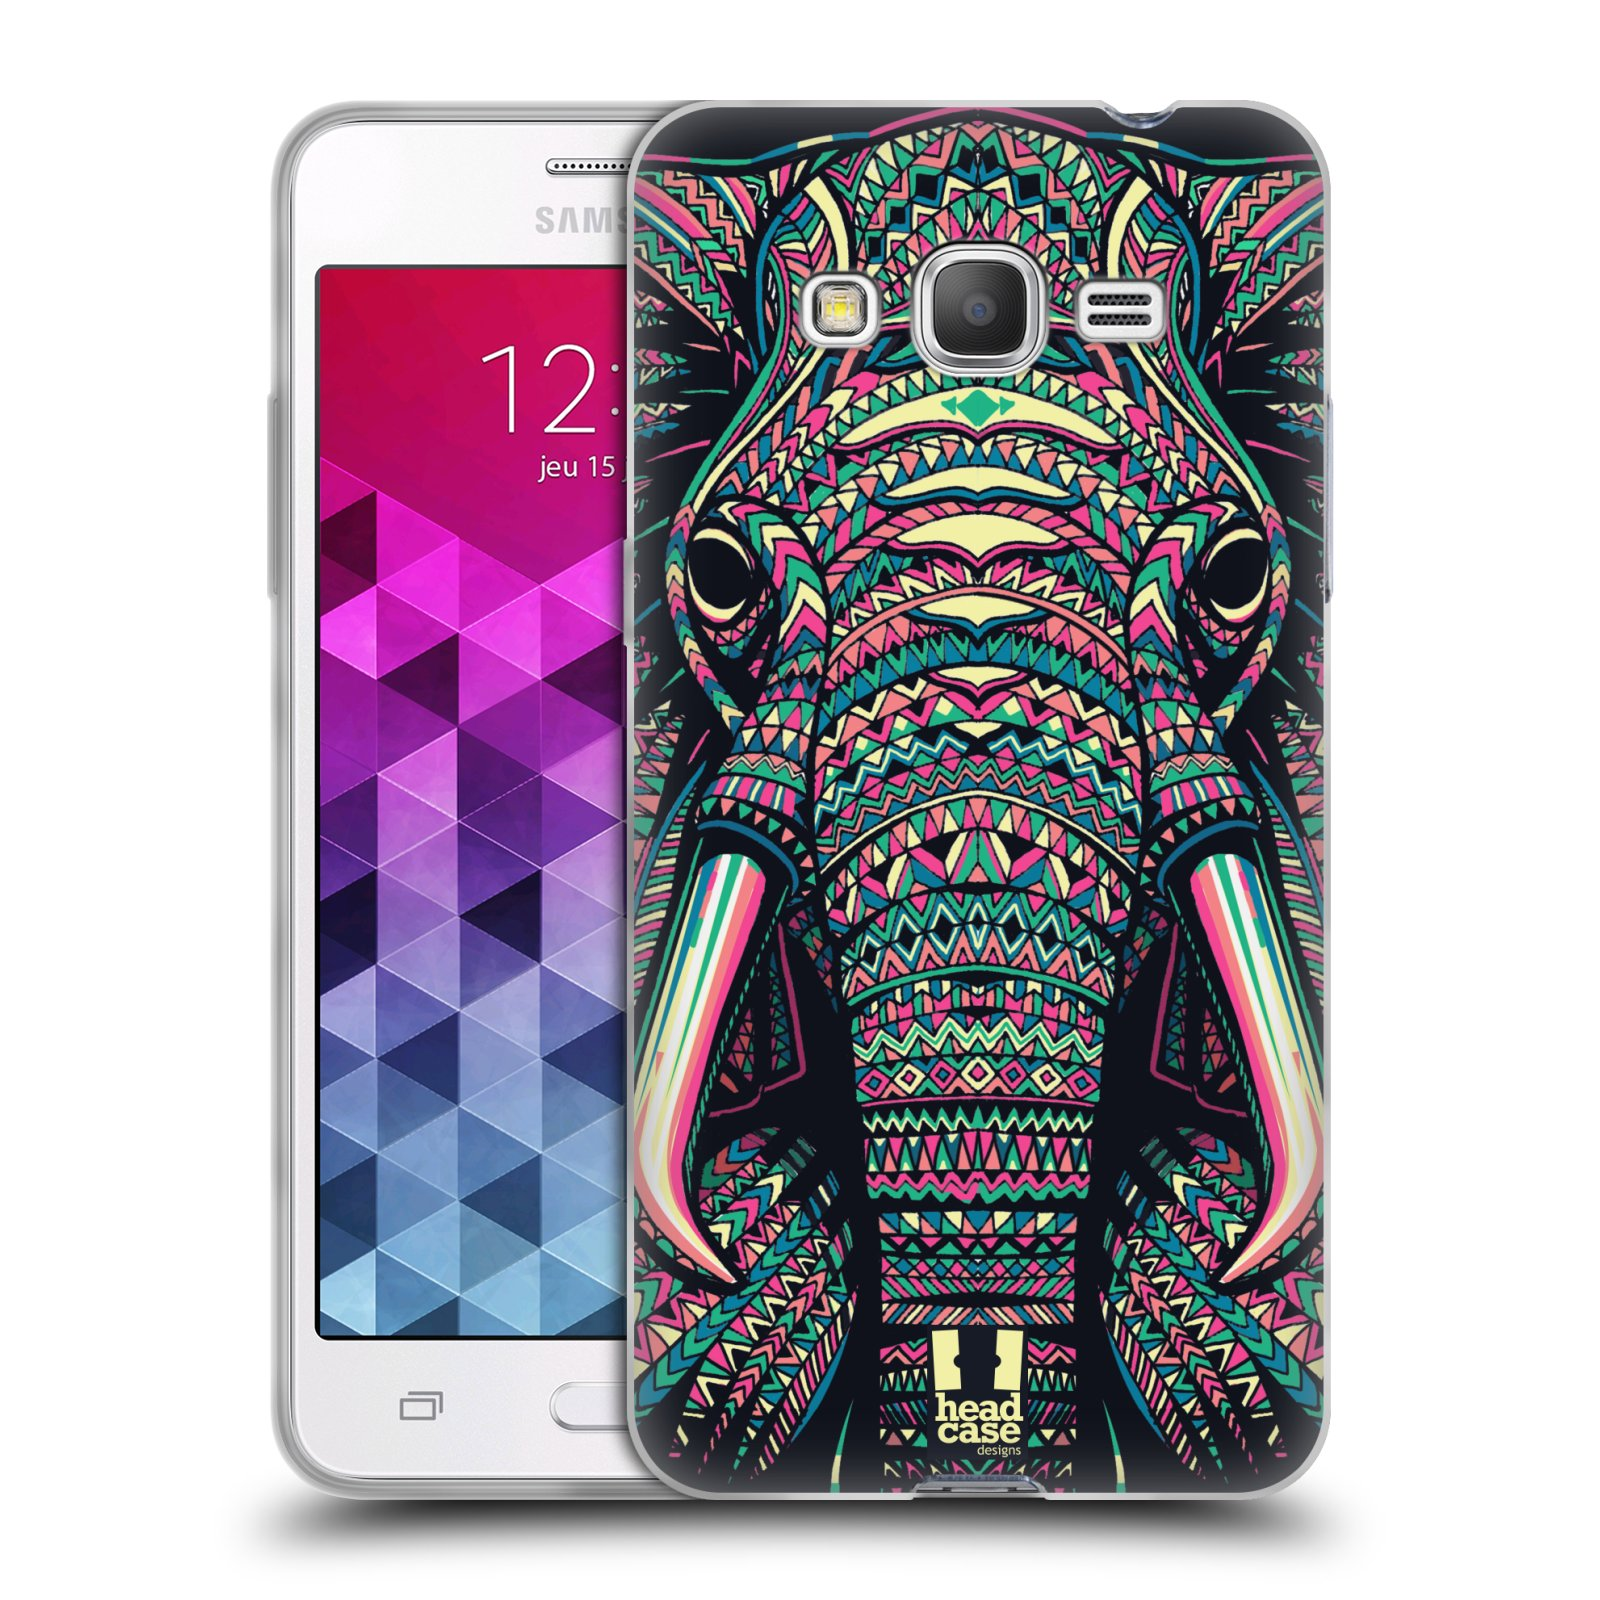 Silikonové pouzdro na mobil Samsung Galaxy Grand Prime HEAD CASE AZTEC SLON